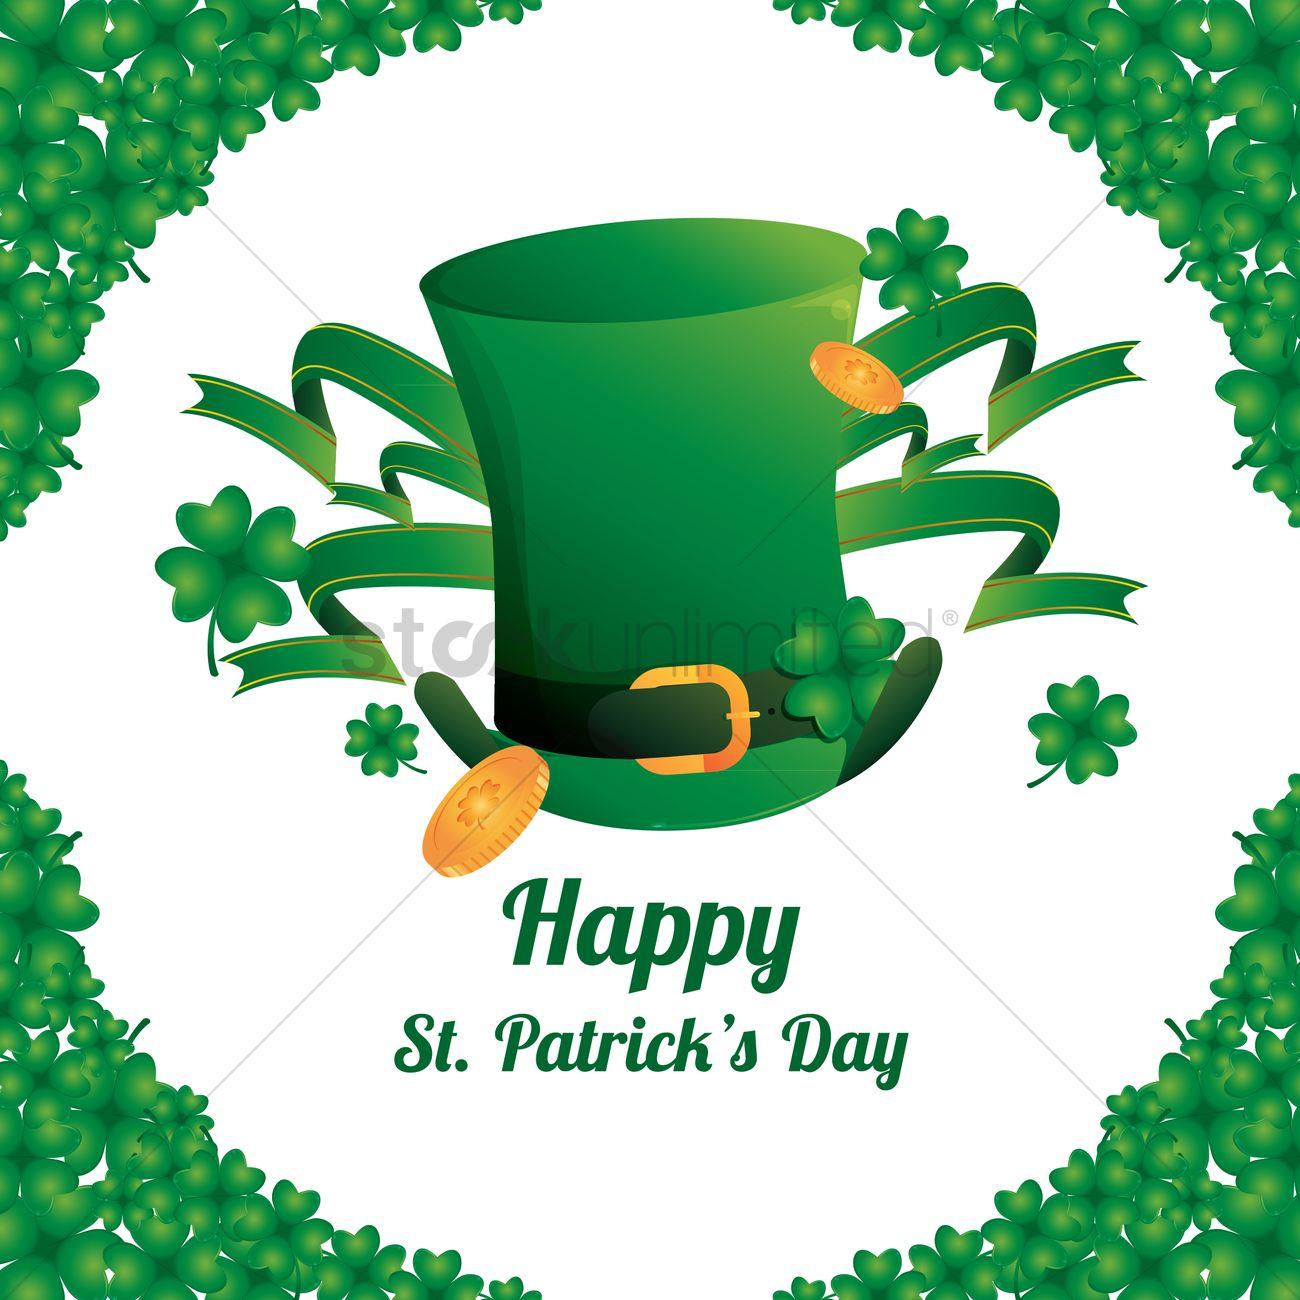 Happy St Patrick S Day Wallpaper Vector Image 1482116